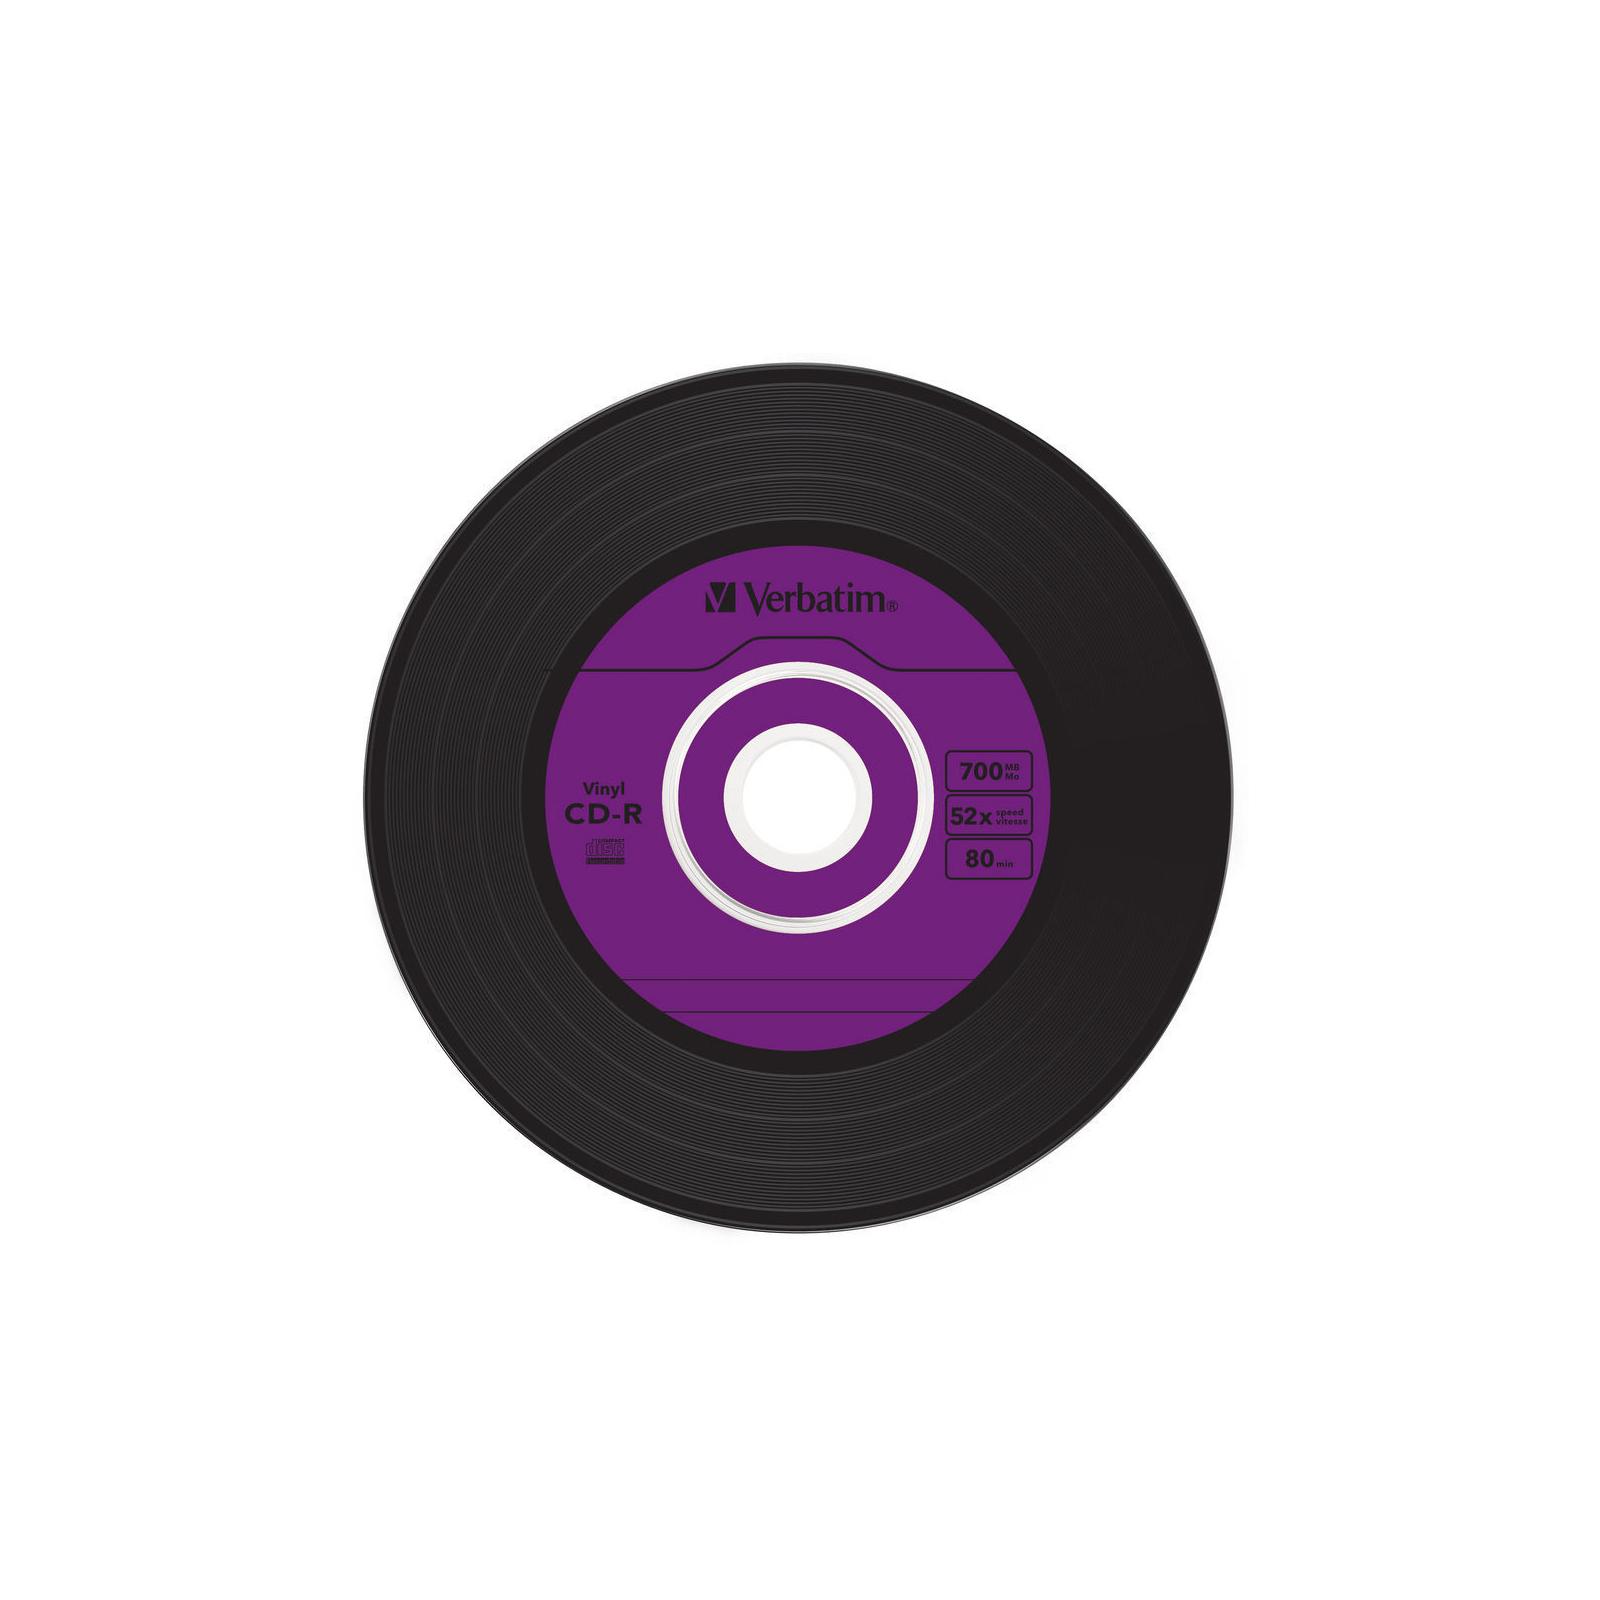 Диск CD Verbatim 700Mb 52x Slim case Vinyl AZO (43426) изображение 5